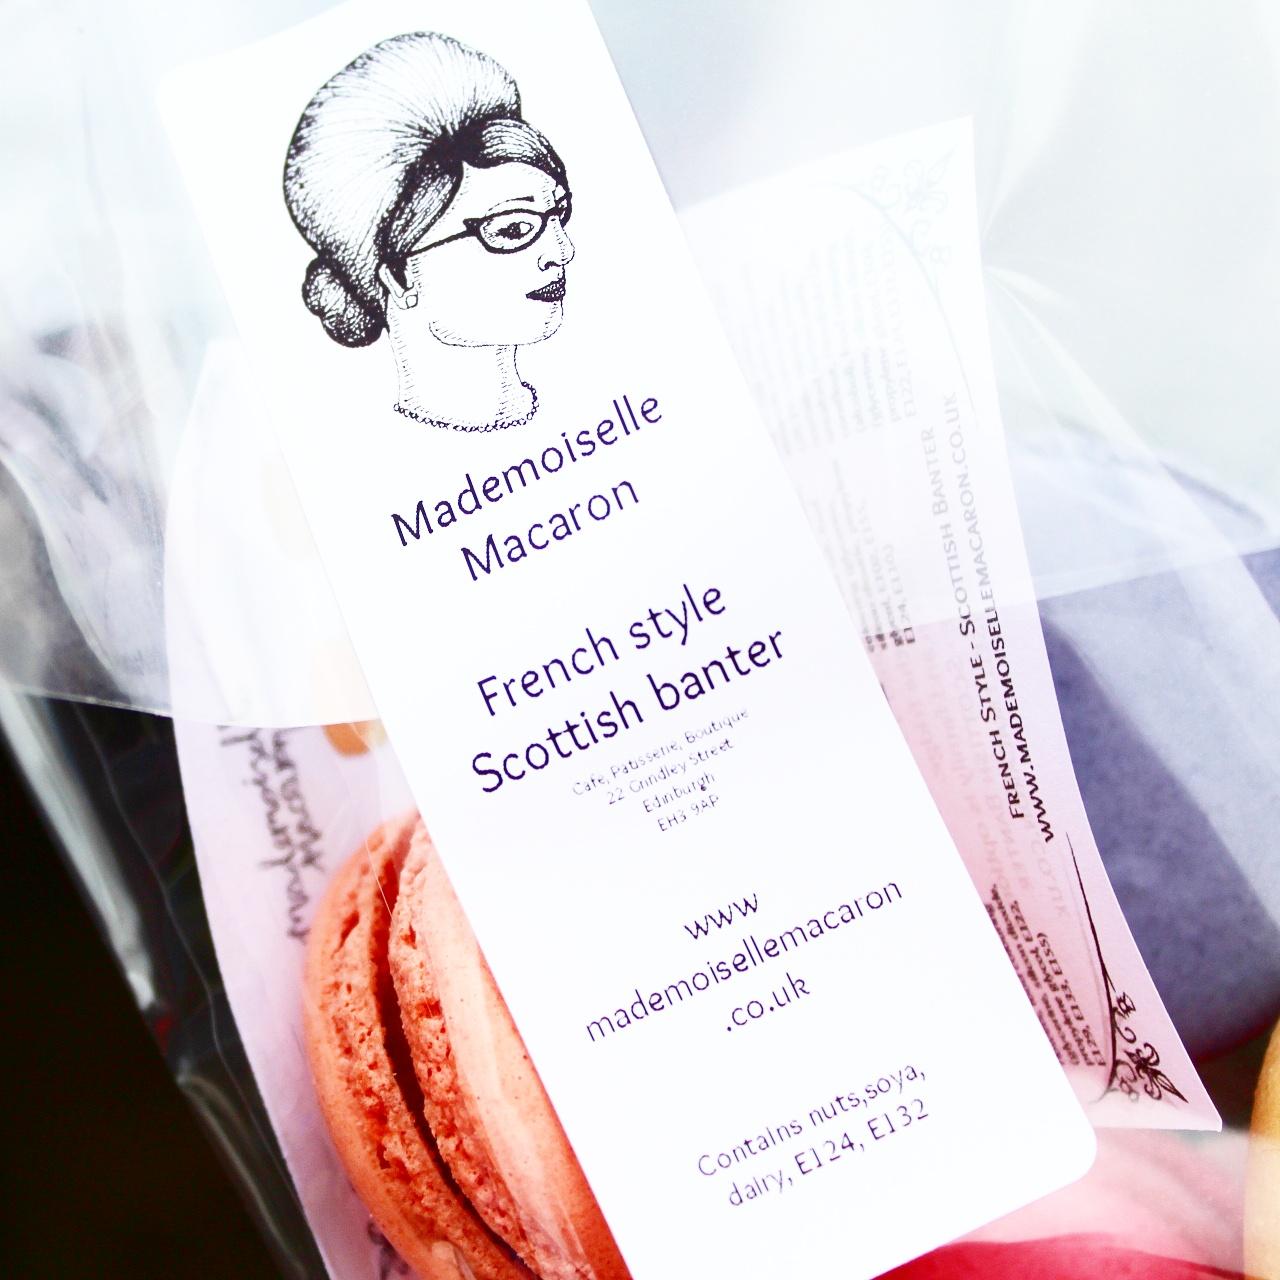 Edinburgh Foodie Festival with Mademoiselle Macaron